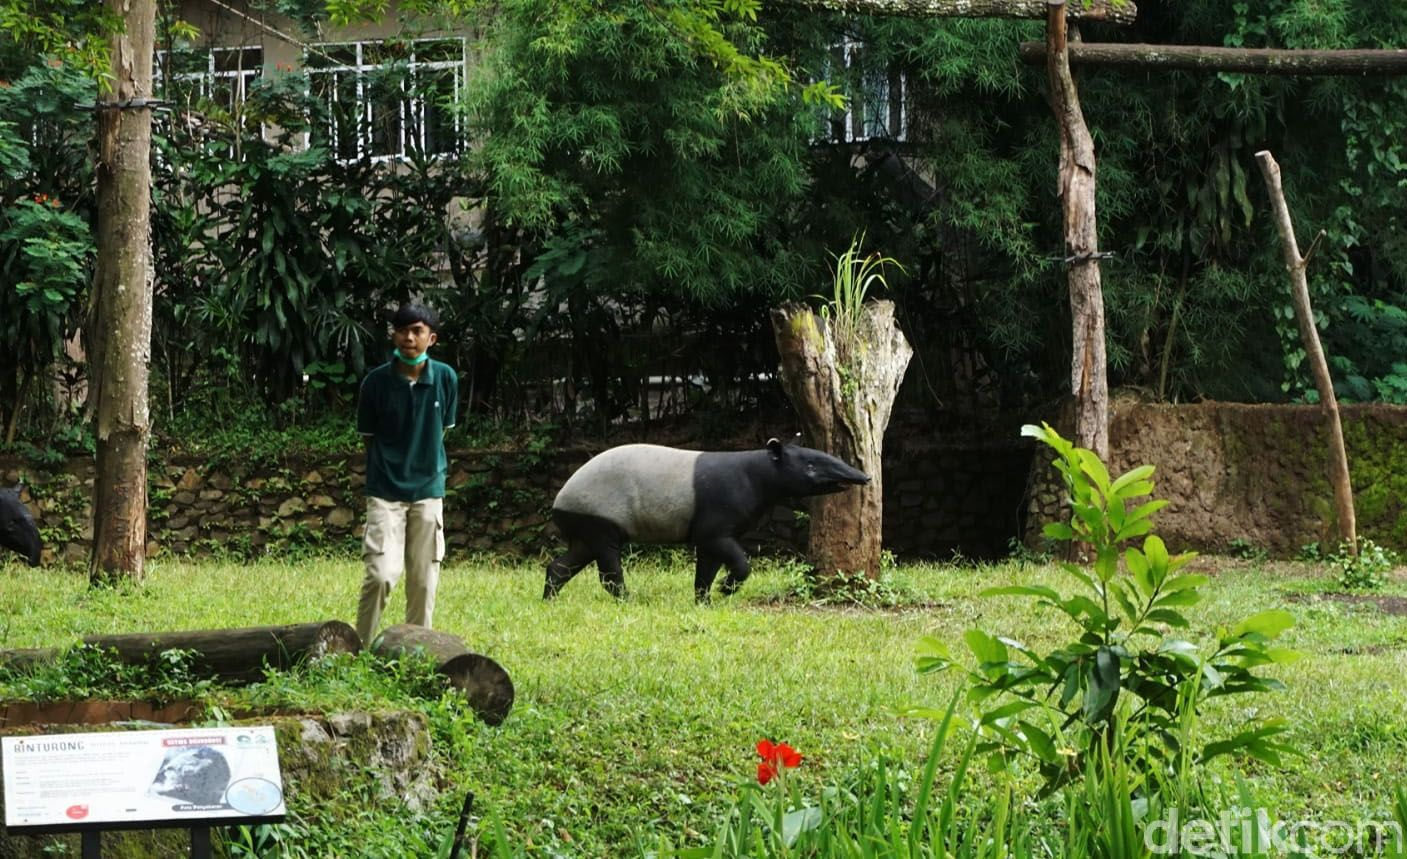 Sebelum pandemi COVID-19, Kebun Binatang Bandung (Bandung Zoological Garden) menjadi salah satu objek wisata primadona wisatawan di Kota Bandung. Namun libur nataru tahun ini tidak seramai tahun sebelumnya.